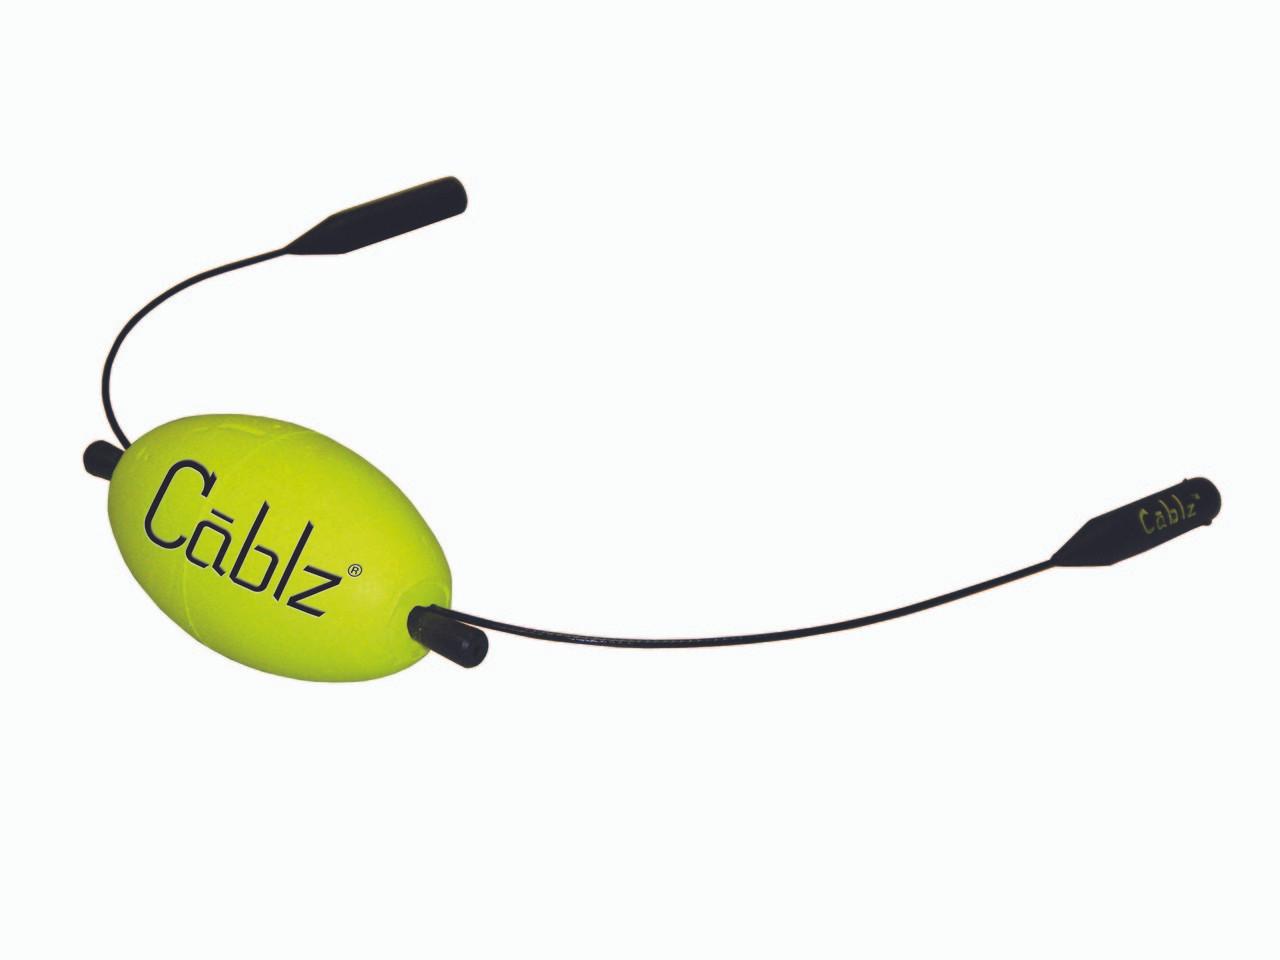 6089ecba2f3 Cablz Flotz Floating Attachement for Cablz - Rhino Safety Glasses